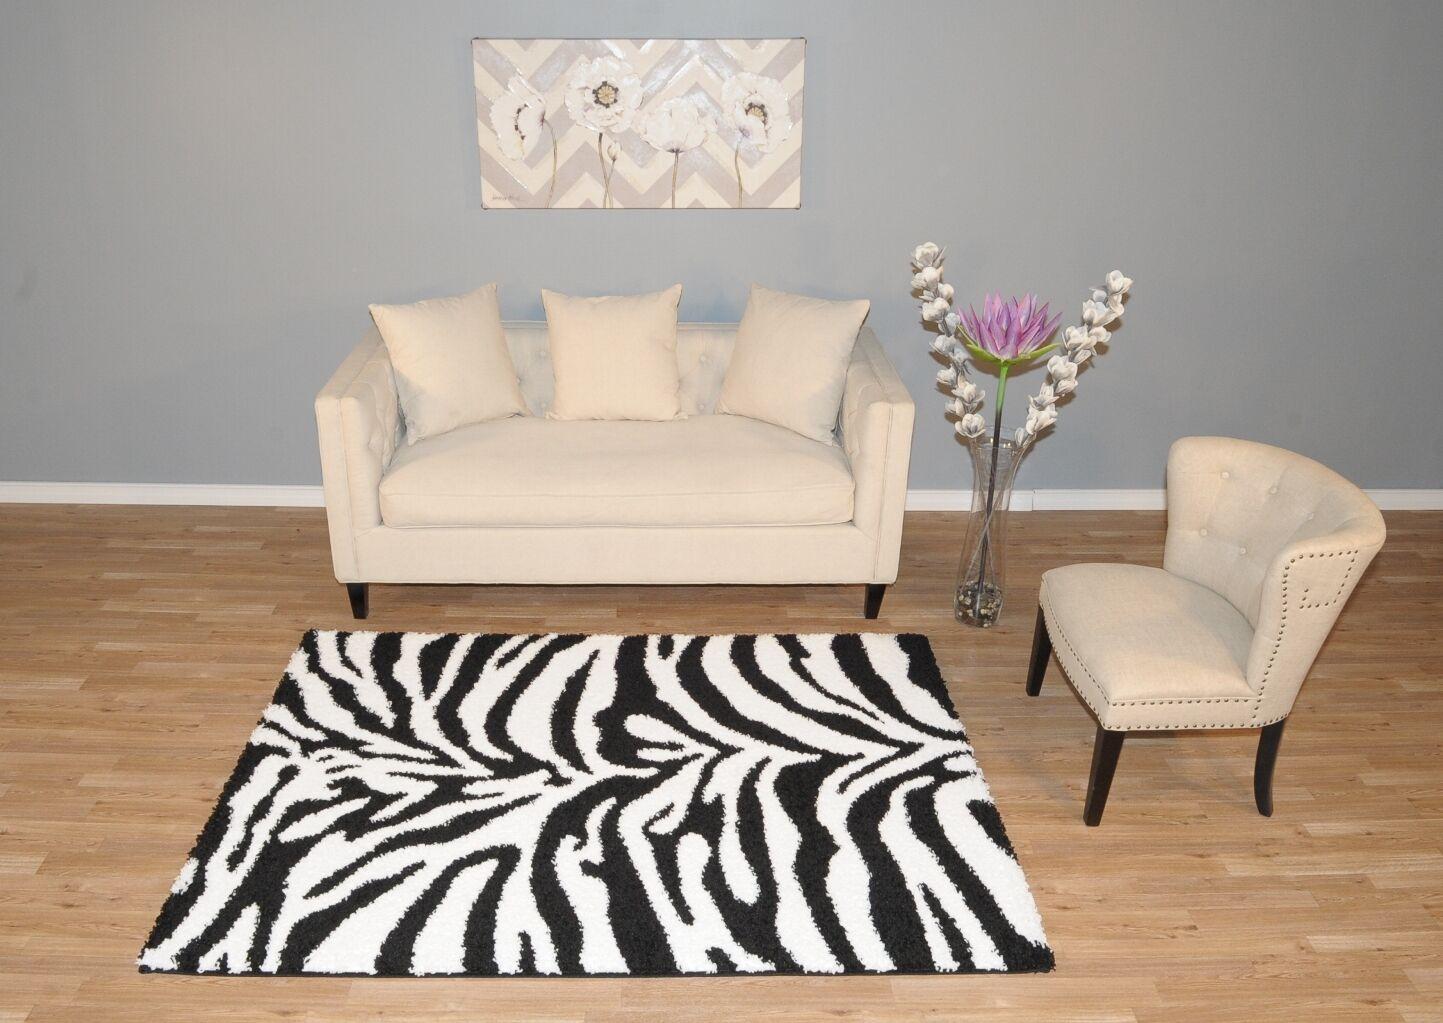 Burns Zebra Print Black/Snow White Shag Area Rug Rug Size: Rectangle 5' x 7'